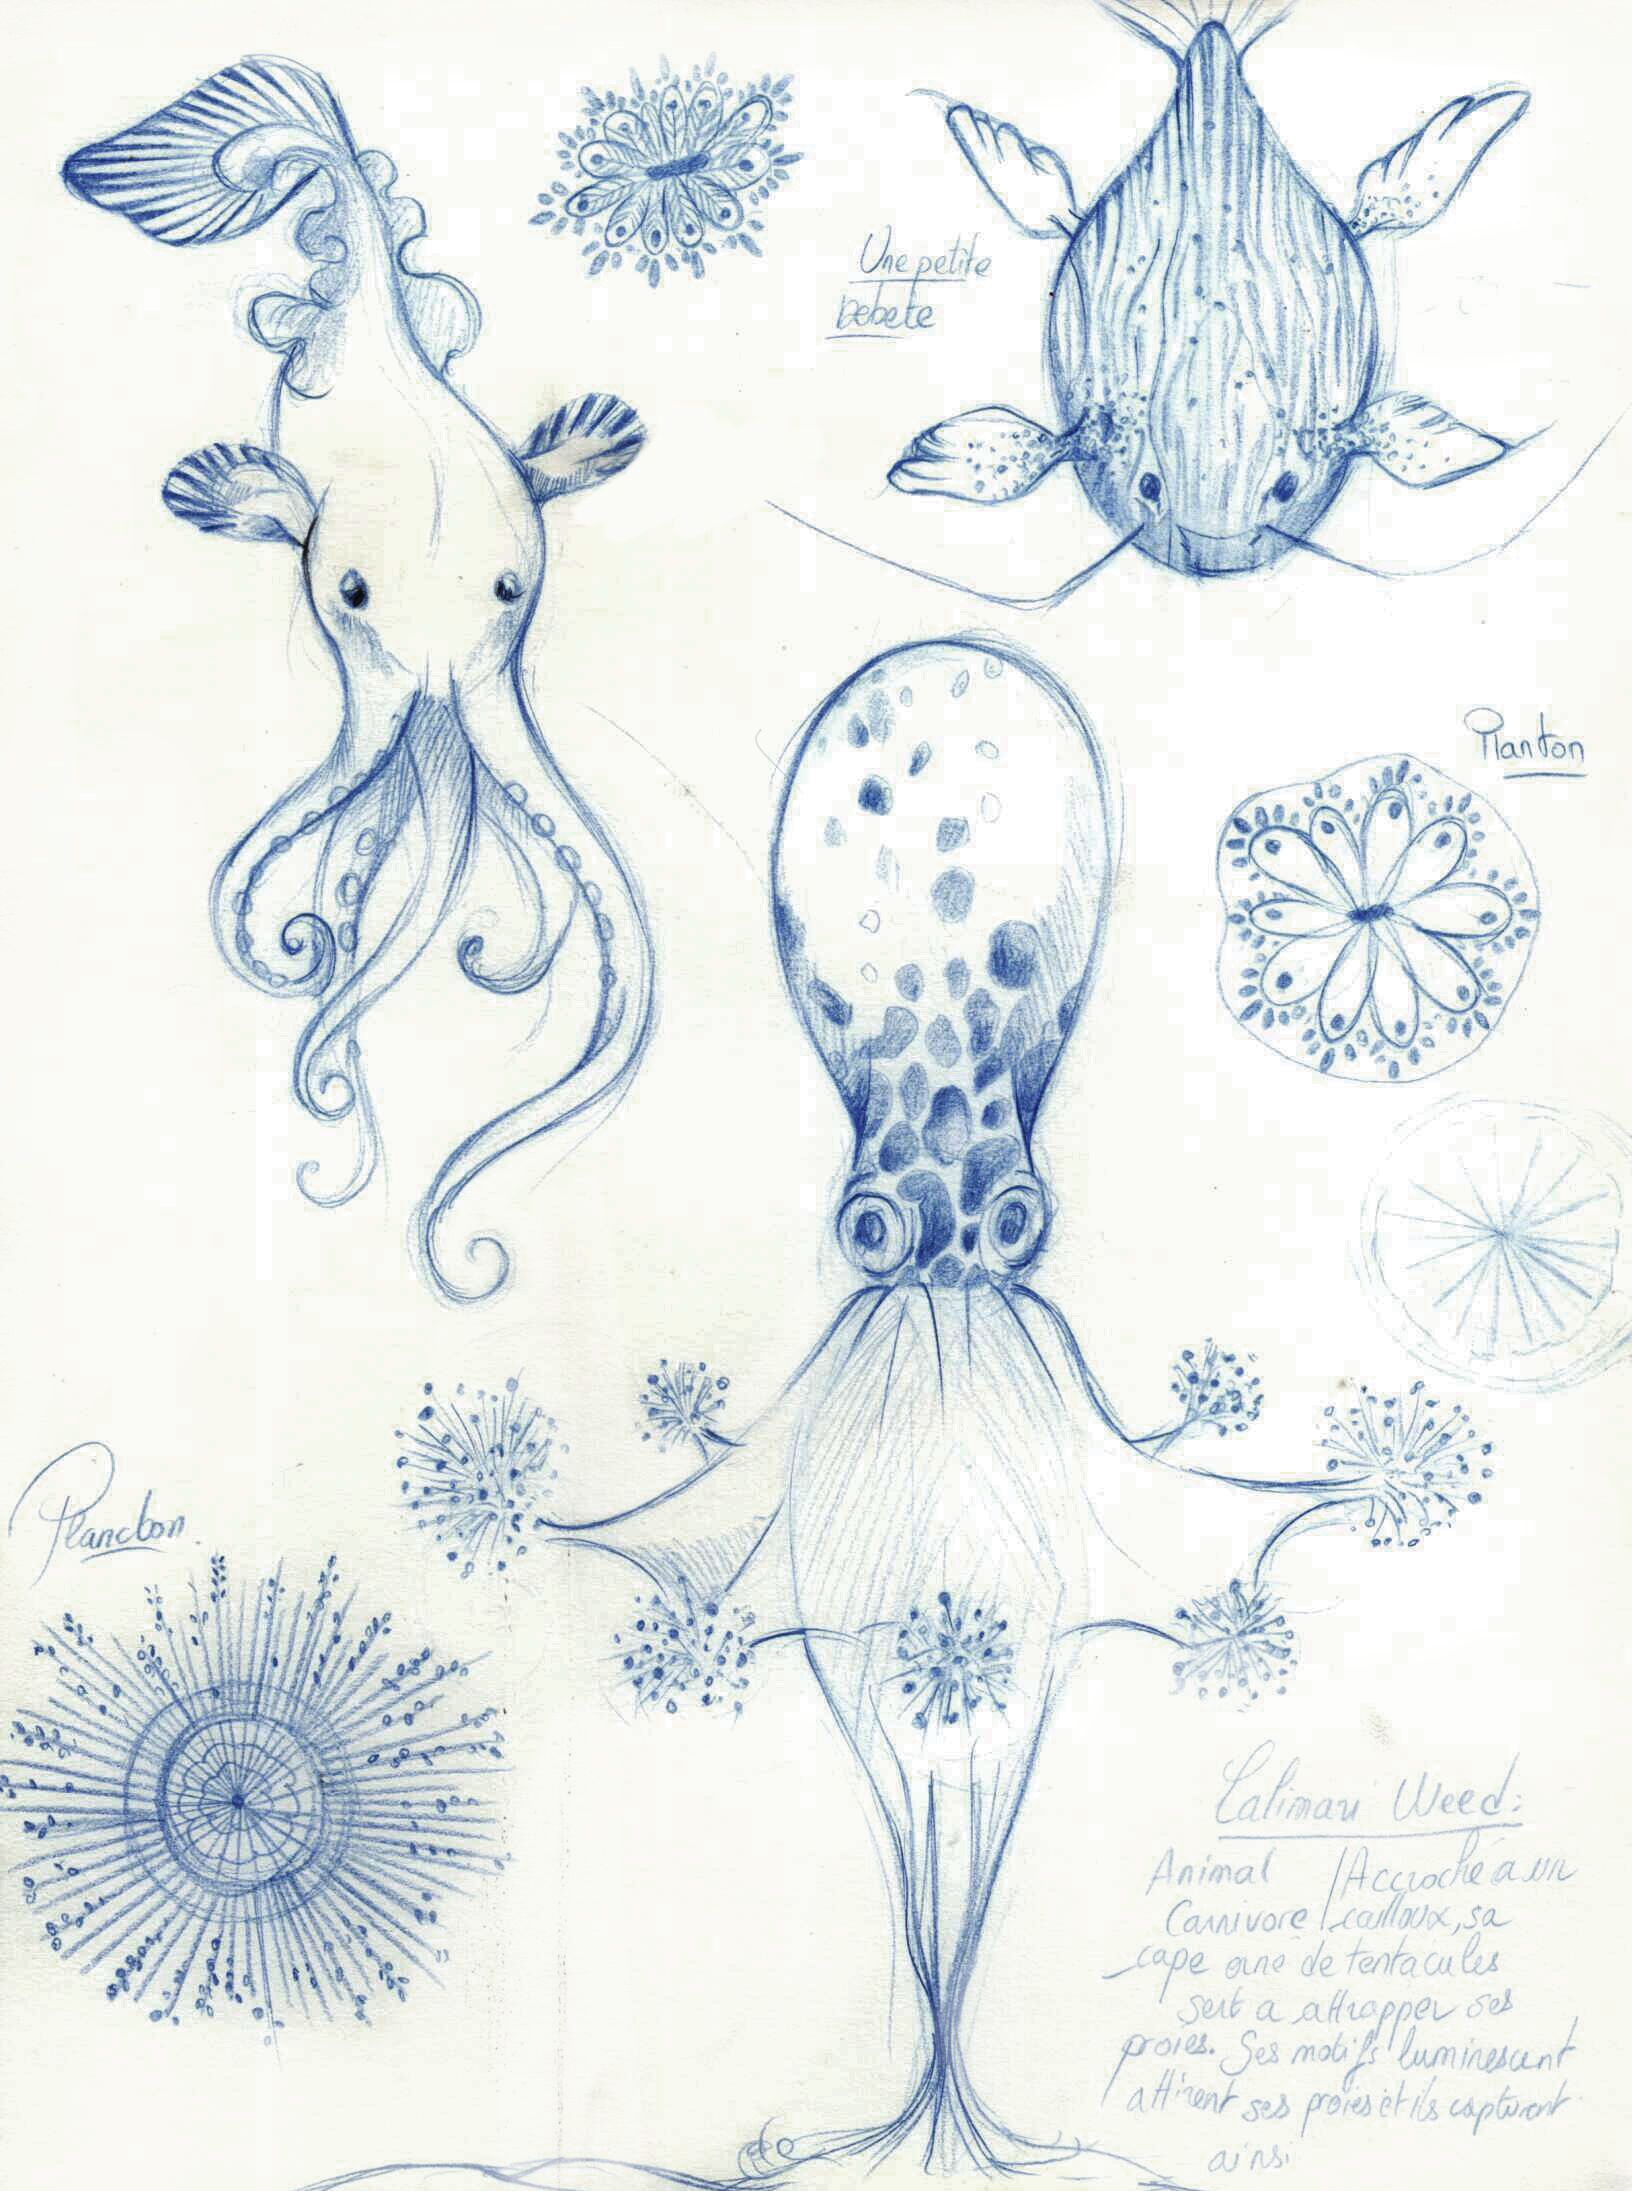 Undersea Creatures Concept Art Character Design Photomontage Gribouillage